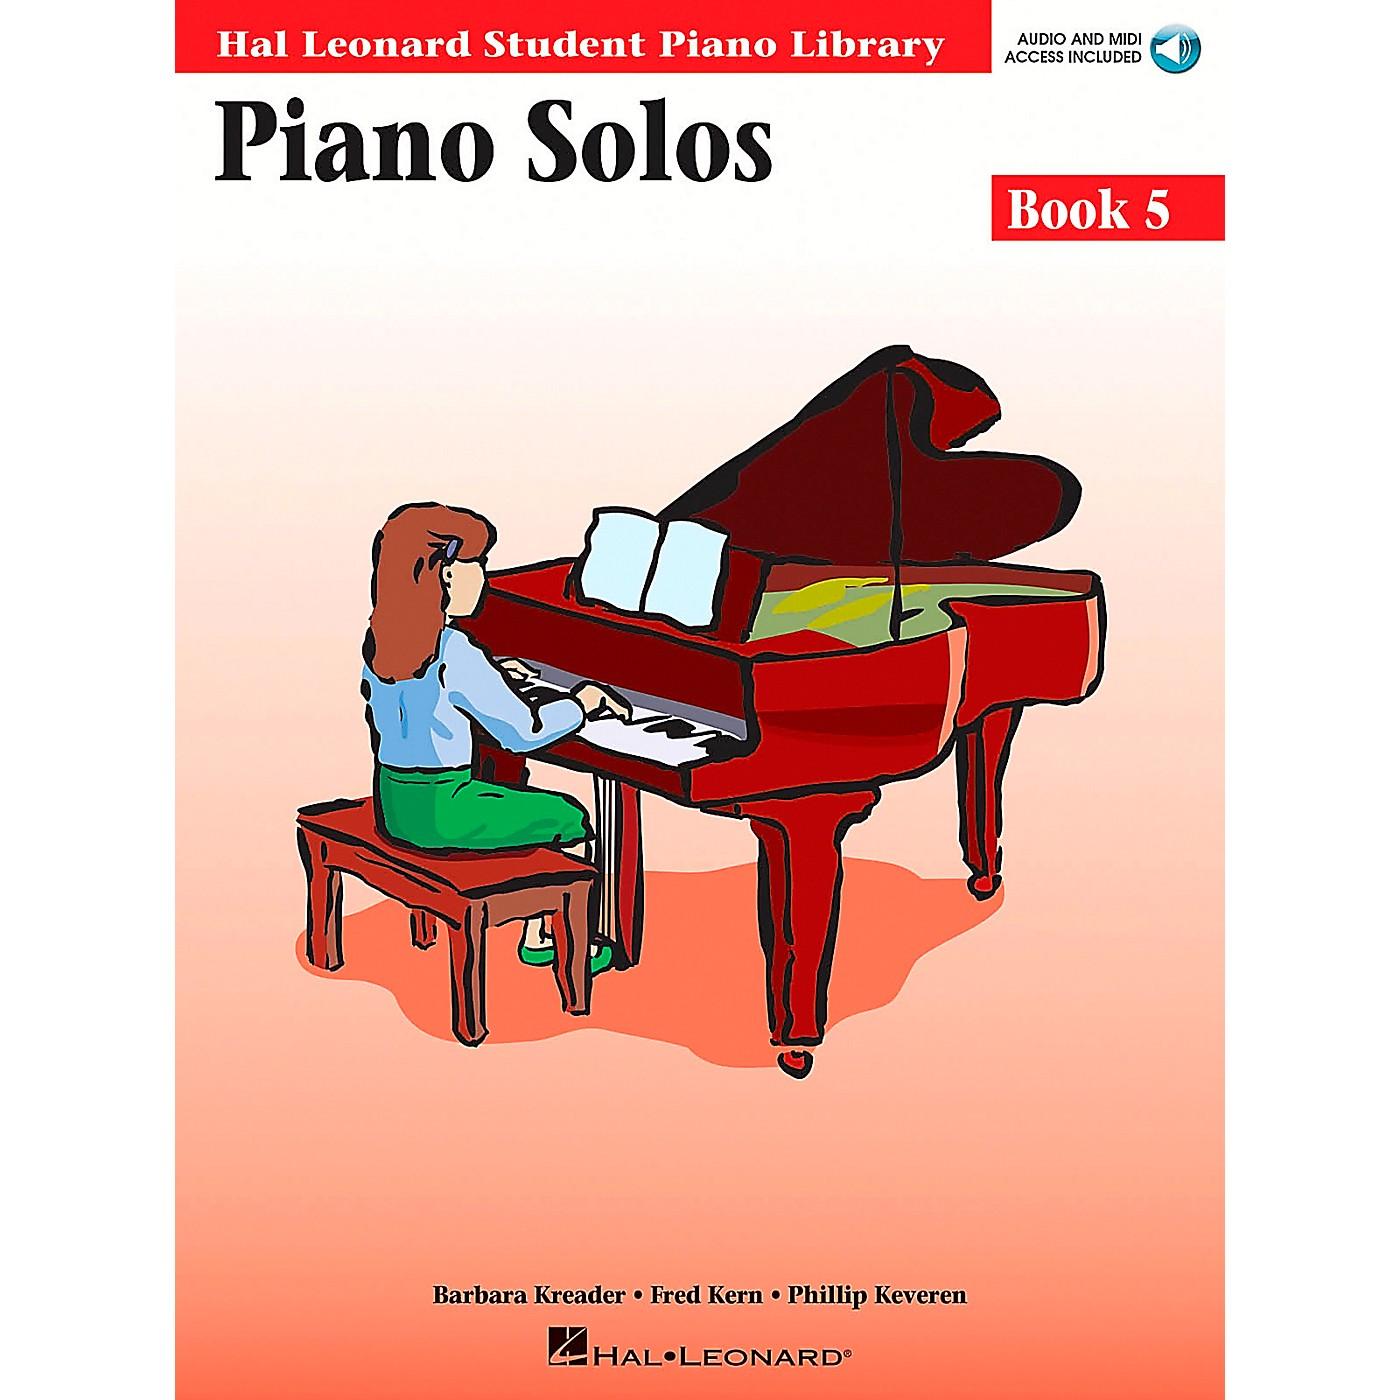 Hal Leonard Piano Solos Book 5 Book/CD Hal Leonard Student Piano Library thumbnail